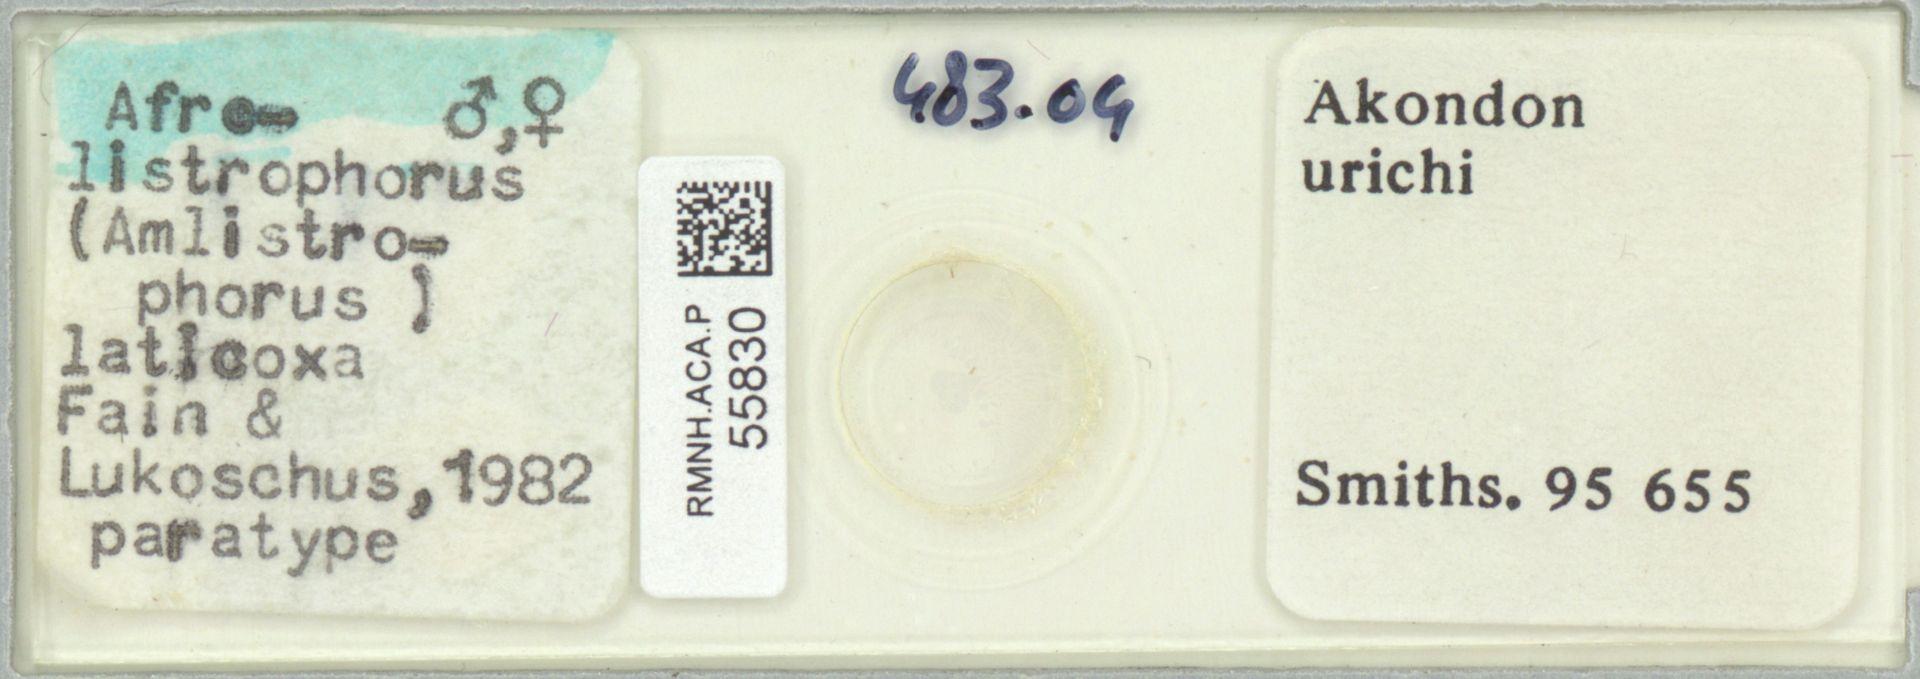 RMNH.ACA.P.55830 | Afrolistrophorus (Amlistrophorus) laticoxa Fain & Lukoschus 1982